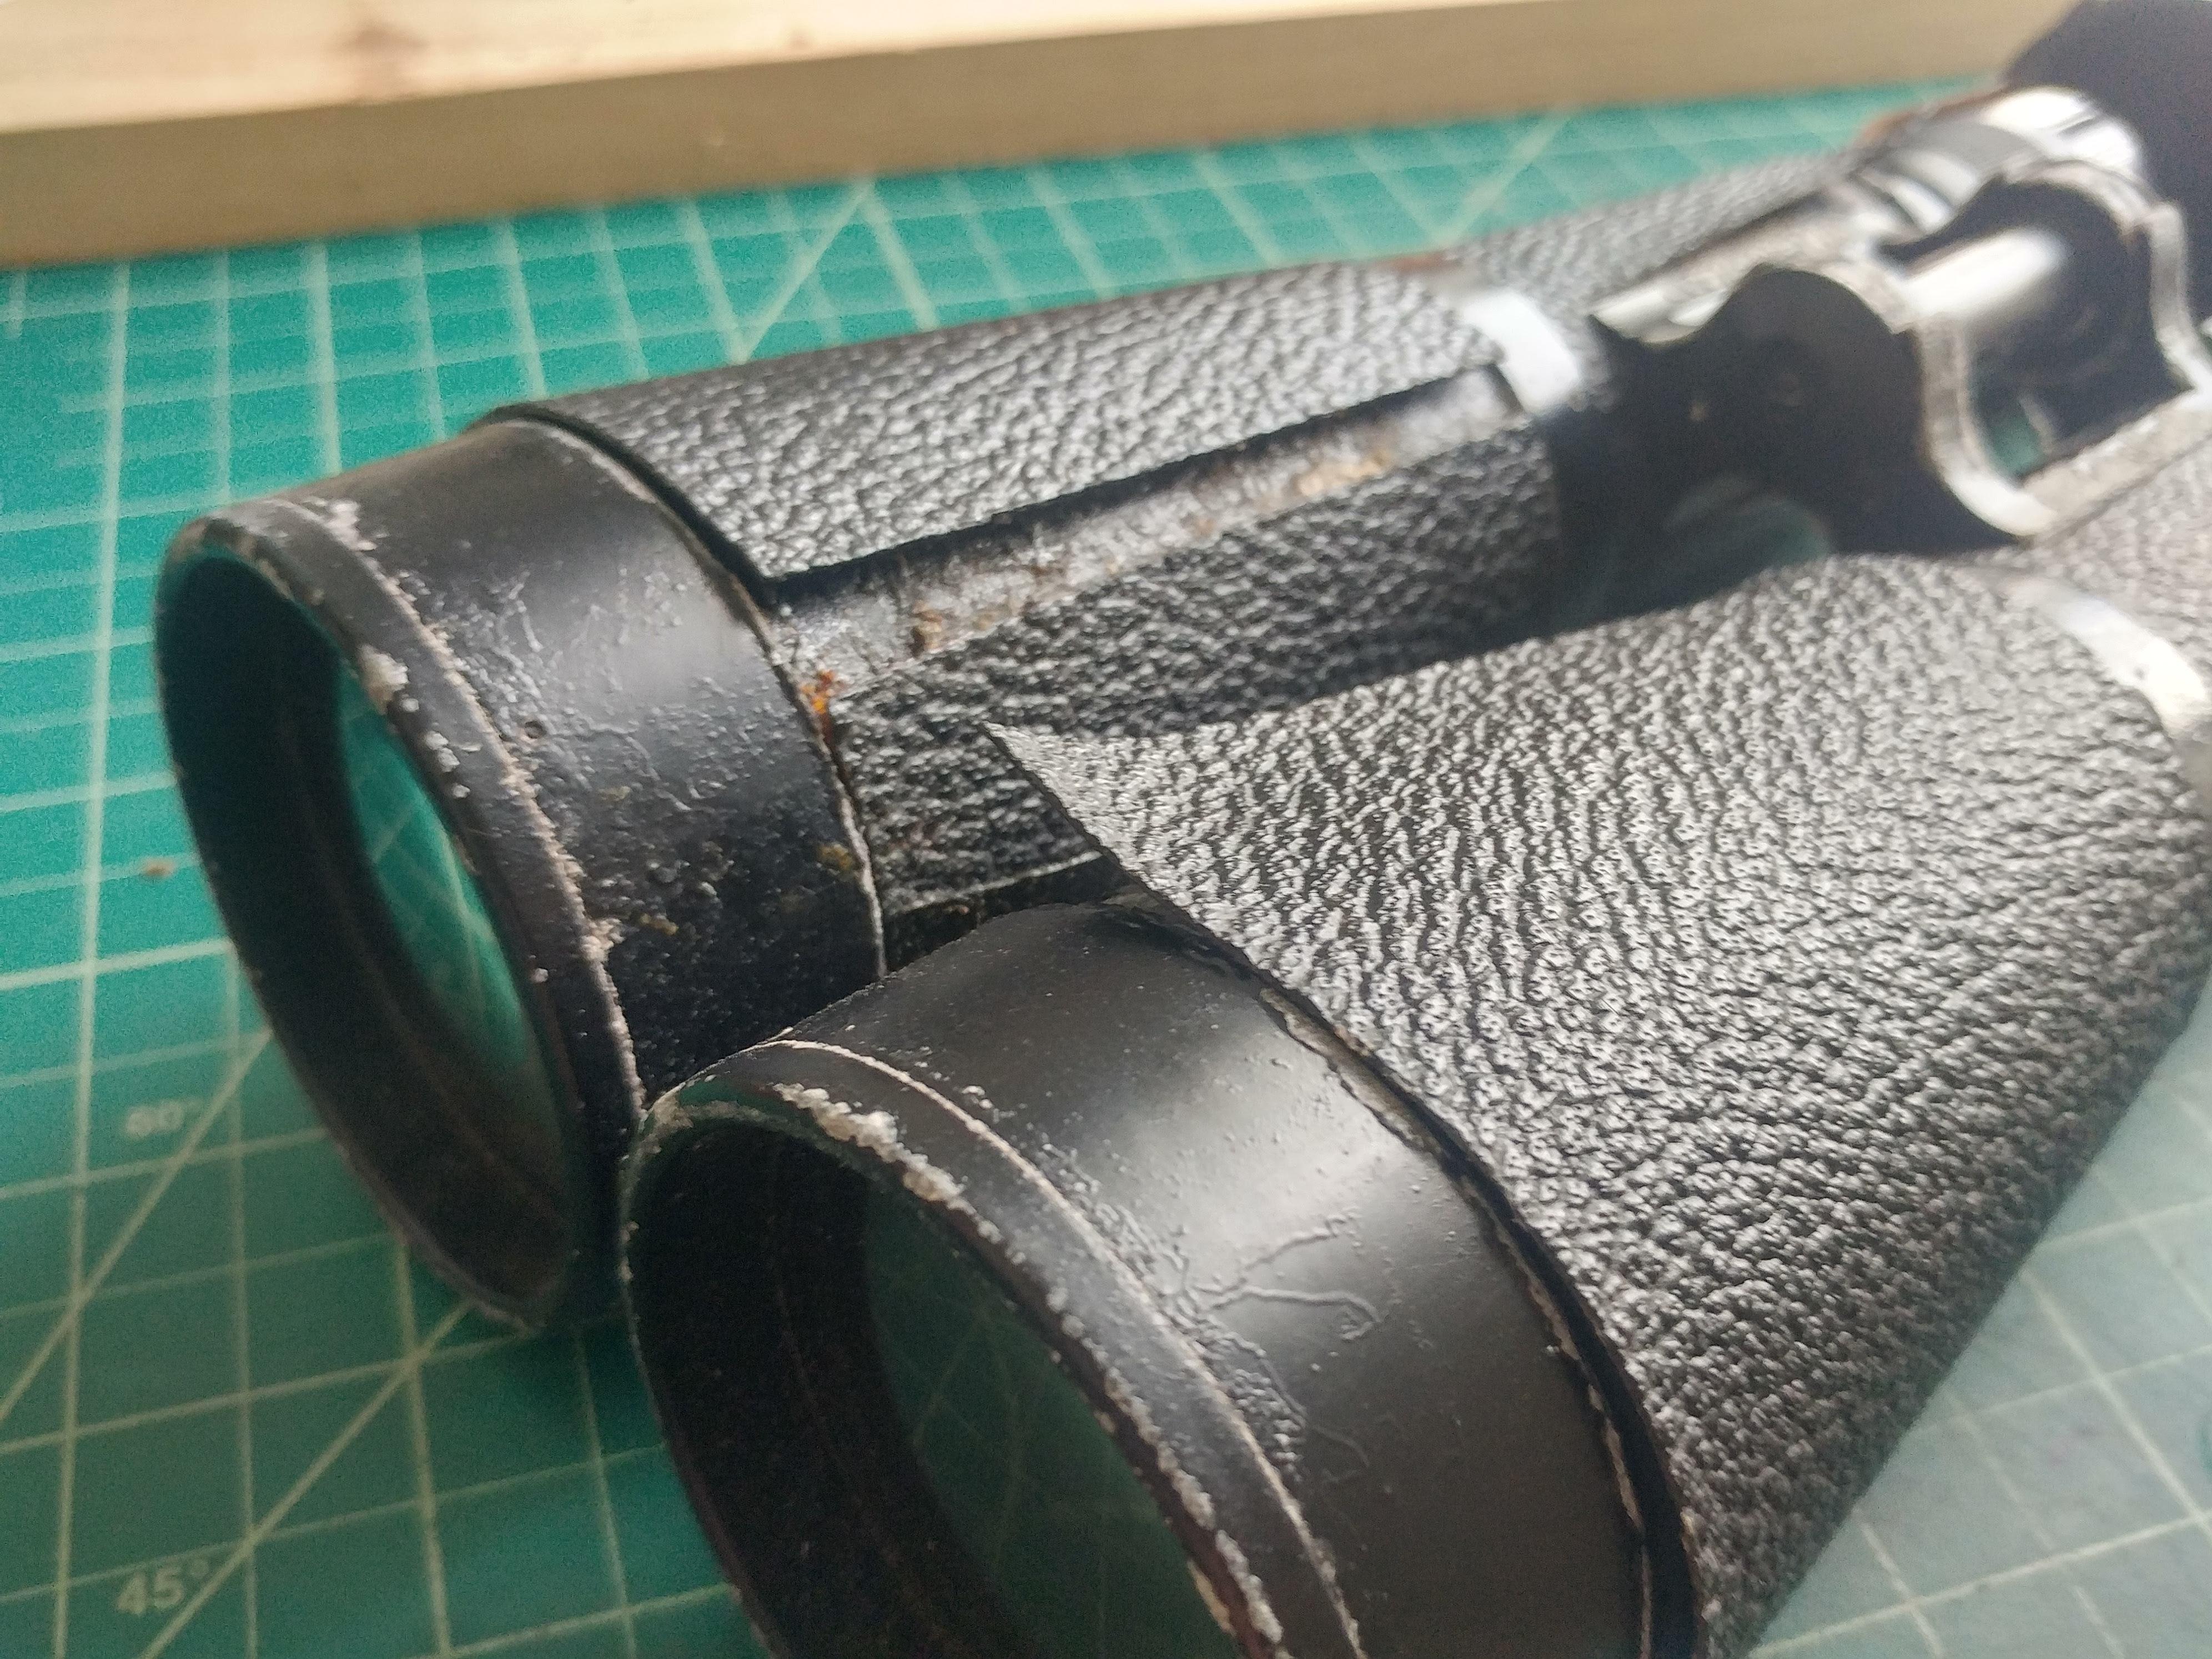 Textured Grip_German WWII Binocs.jpg